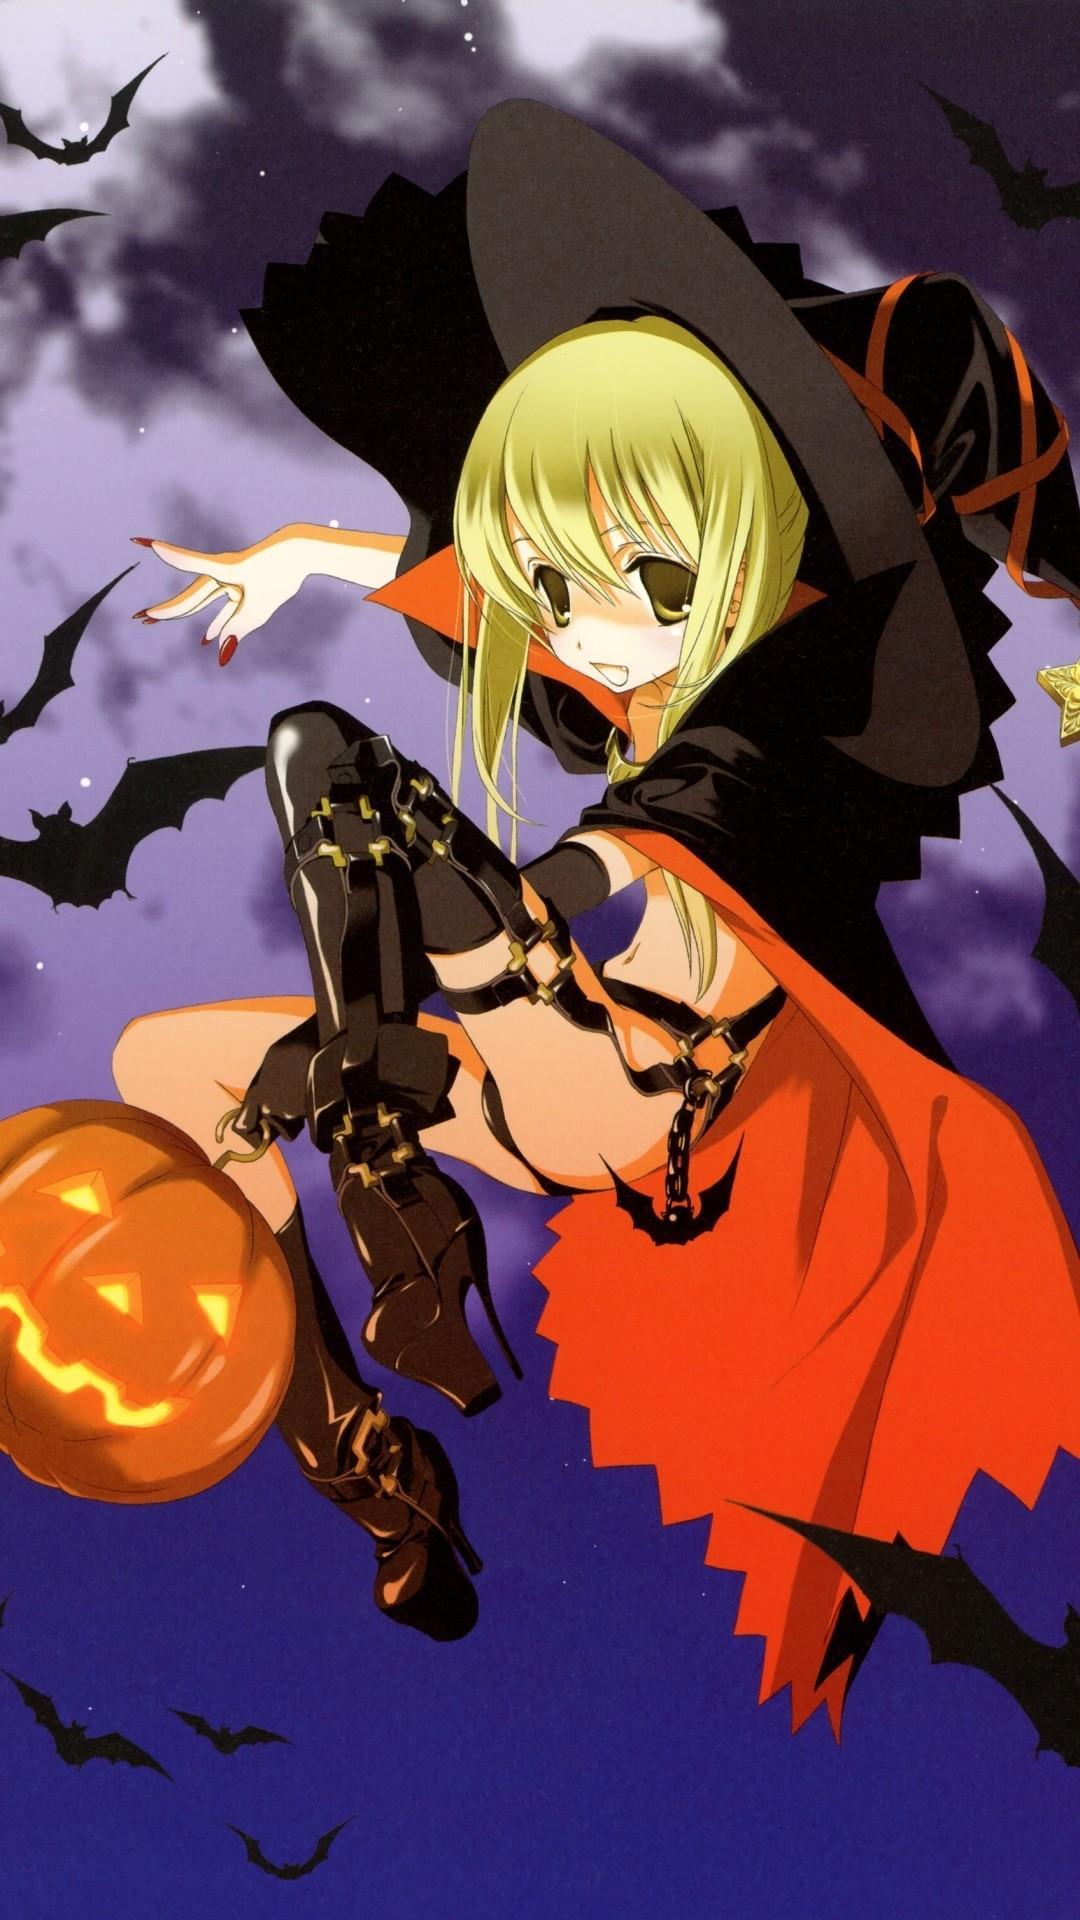 Anime Halloween HD Phone Wallpapers - Wallpaper Cave